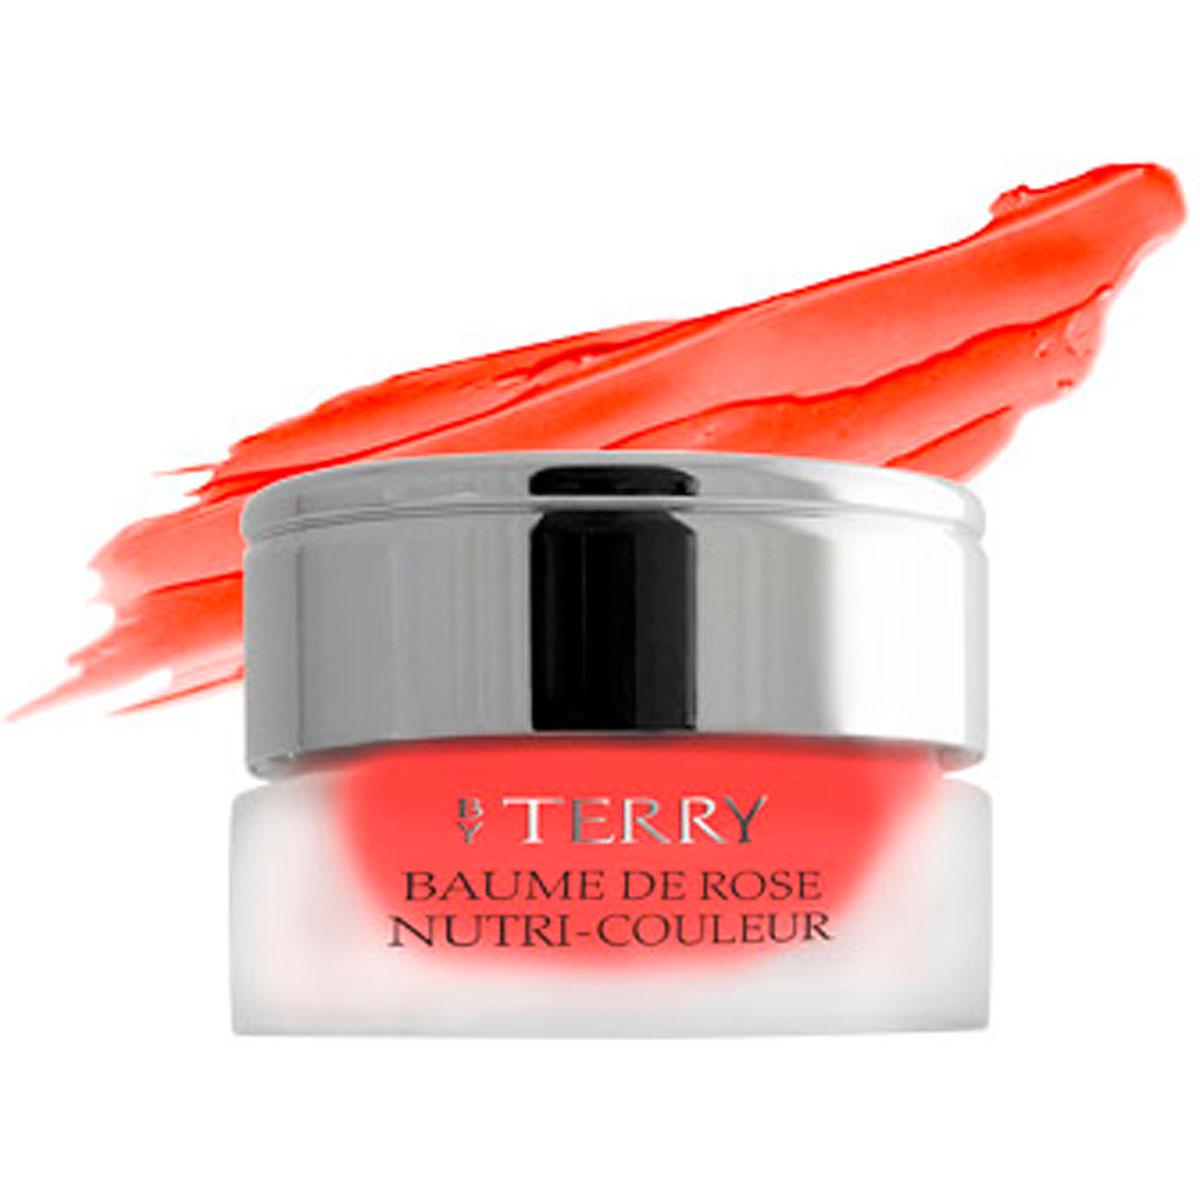 By Terry Makeup for Women, Baume De Rose - Tinted Lip Balm - N 2 Mandarina Pulp, 2019, 7 gr